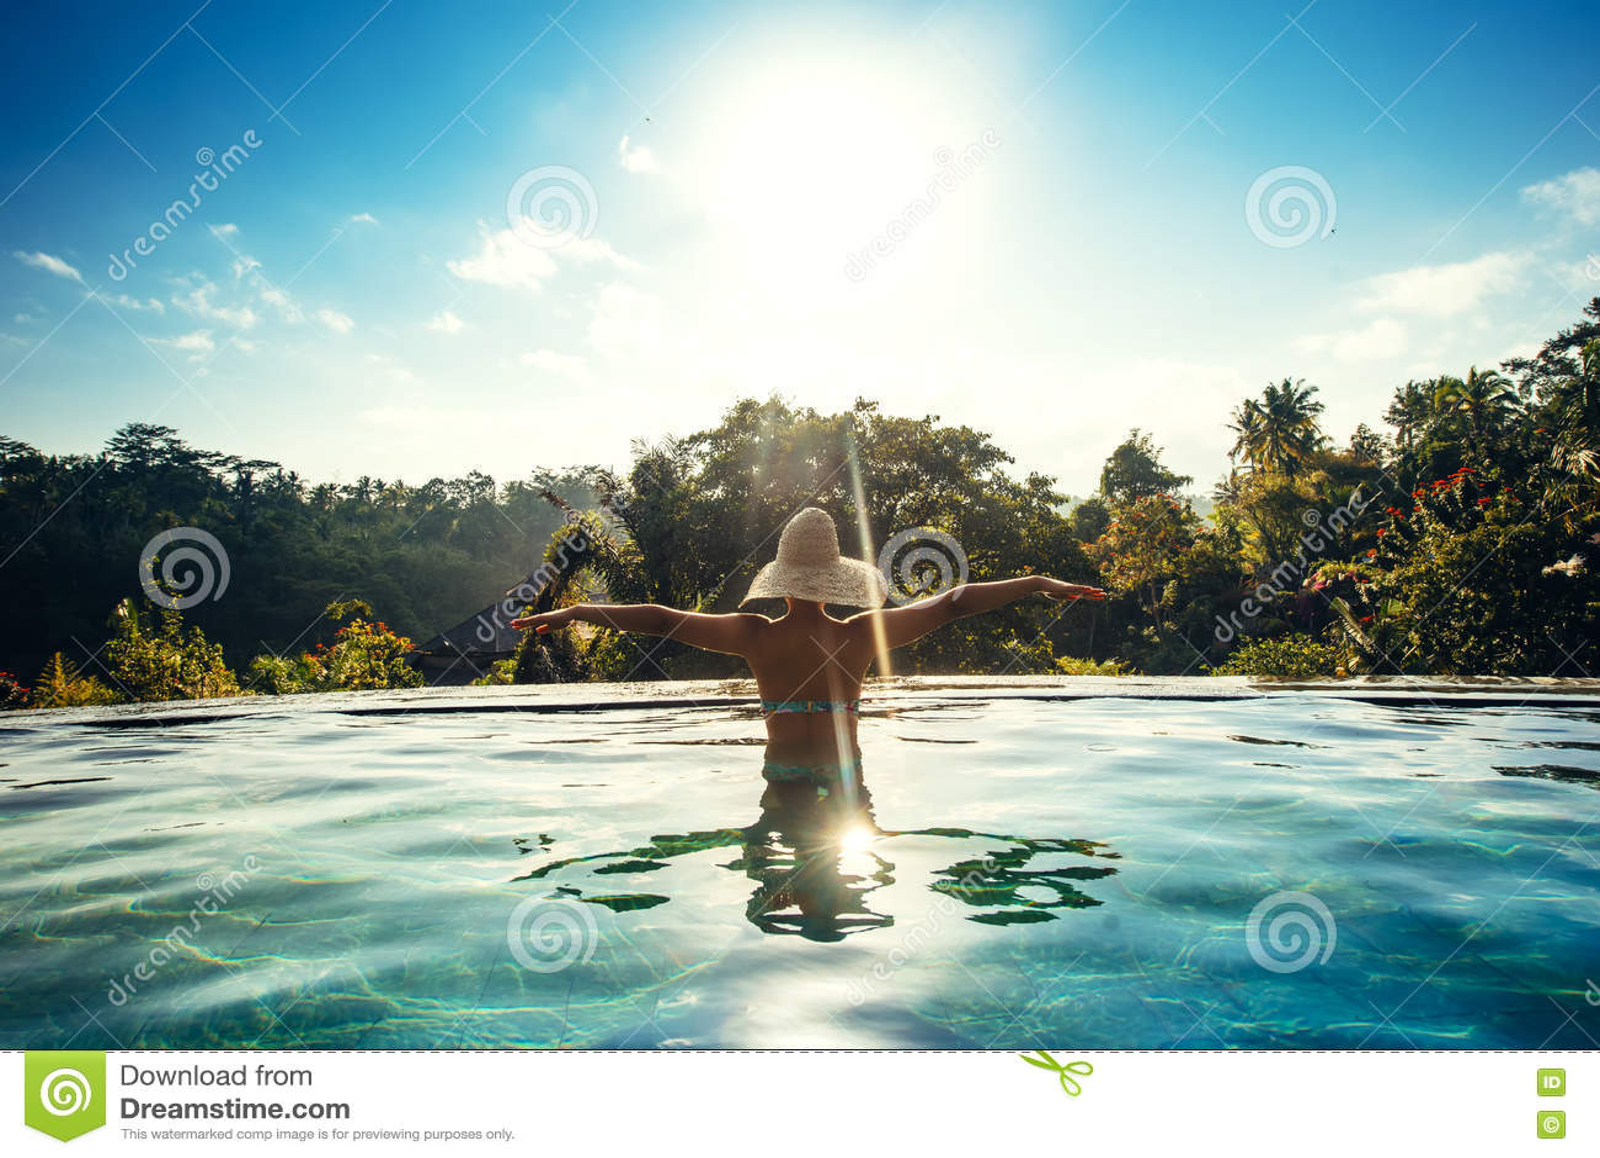 Infinity pool on luxurious exotic island. Portrait of girl wearing hat enjoying the sun at pool